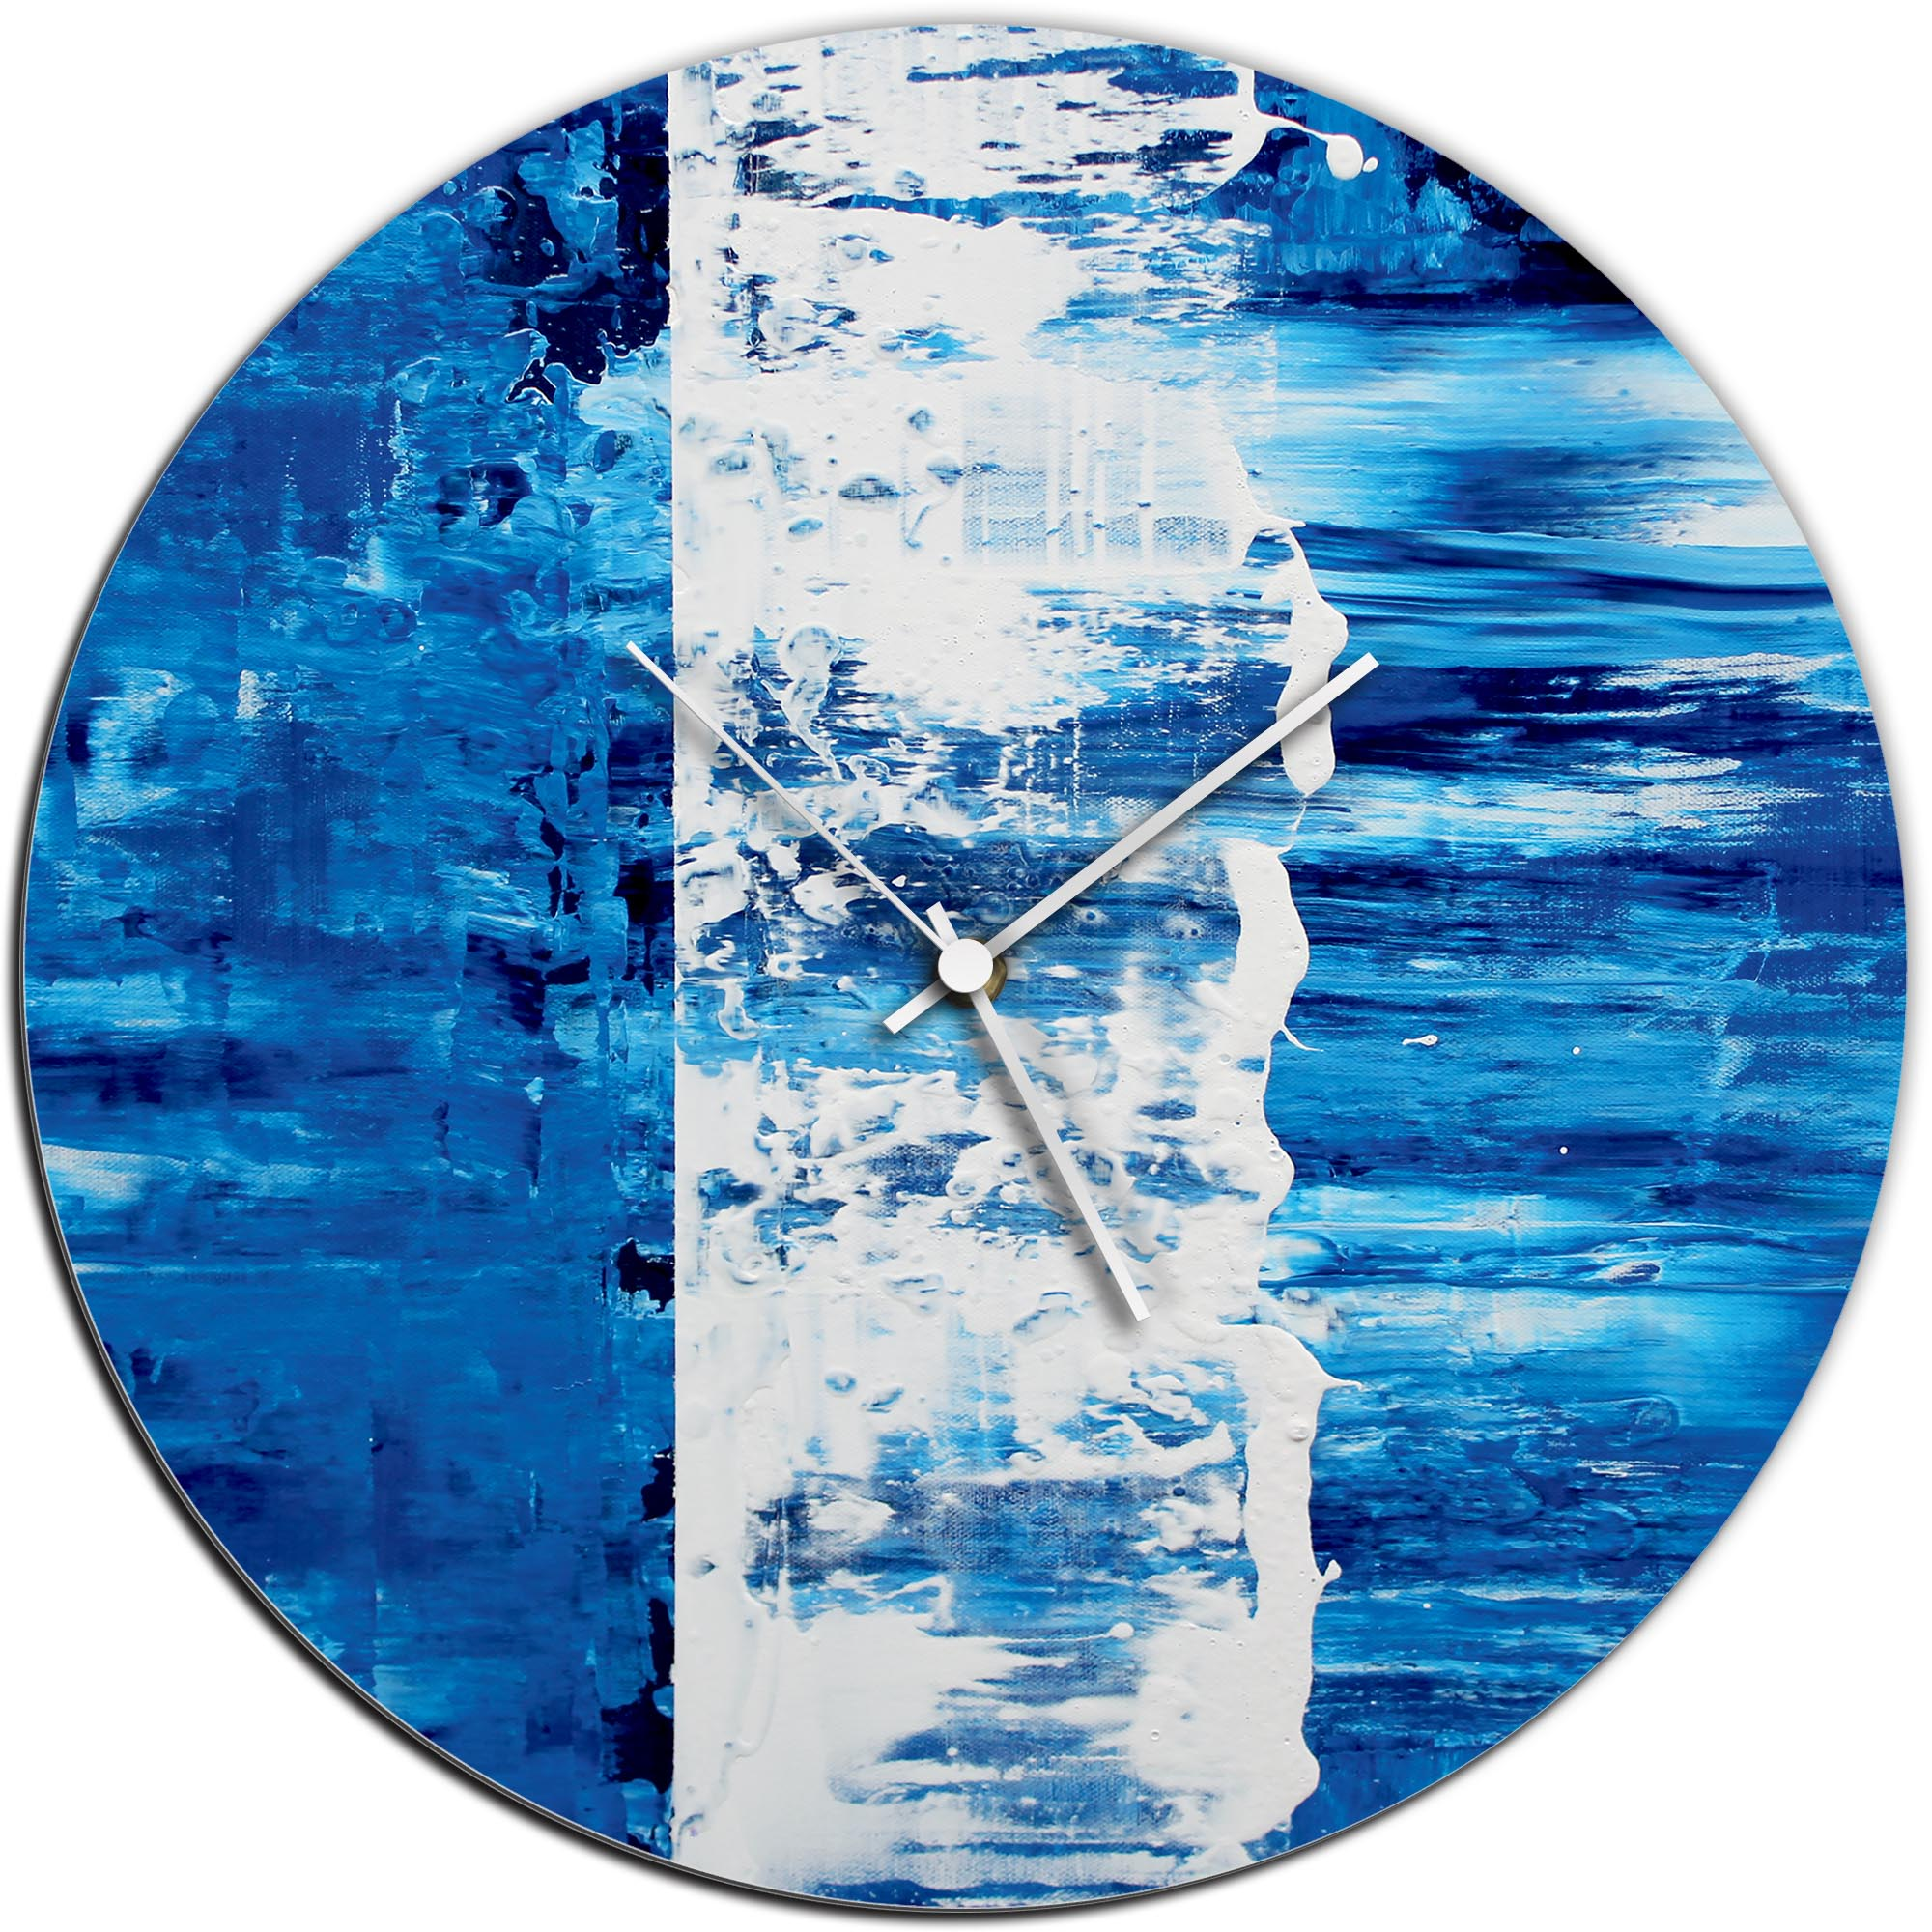 Mendo Vasilevski 'Blue Street Circle Clock' 16in x 16in Modern Wall Clock on Aluminum Composite